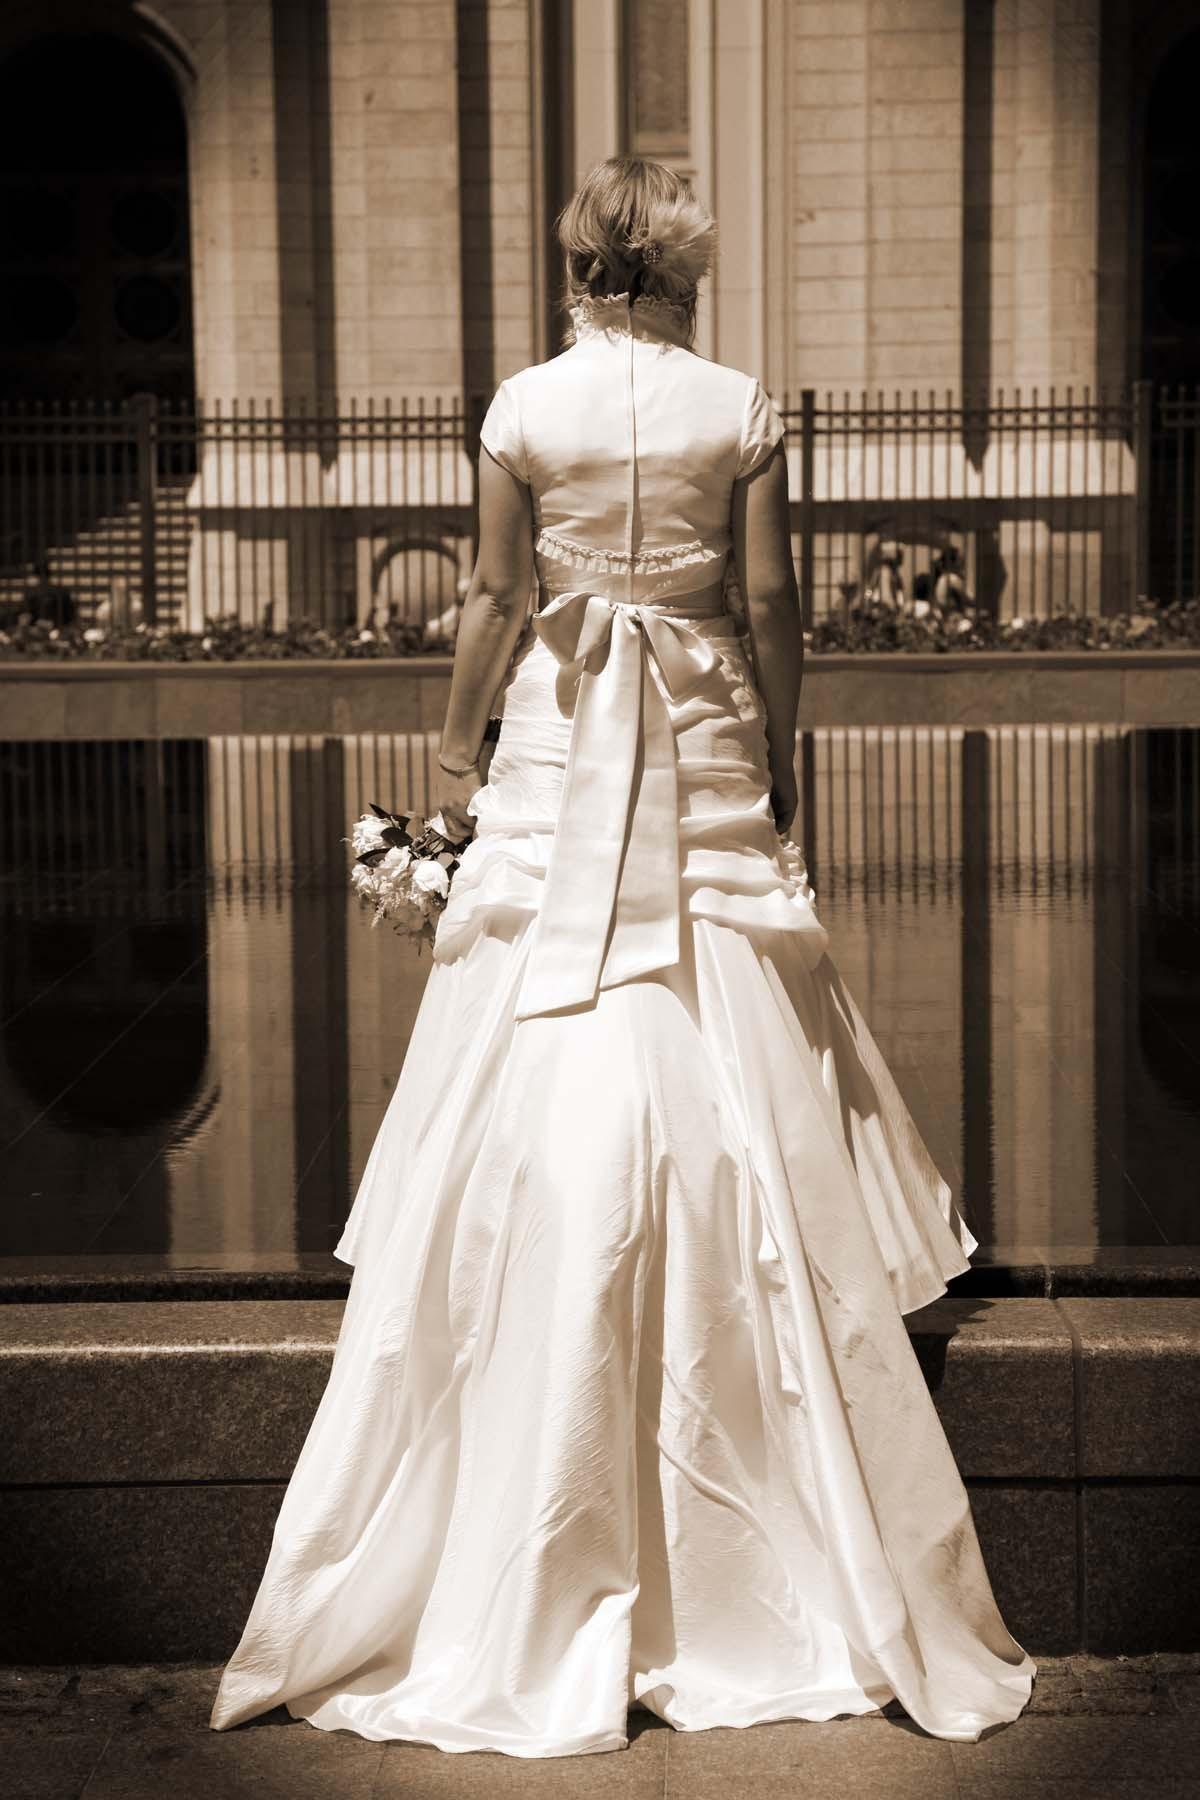 Sussex & Surrey Wedding Photographer - Bride & Groom (17)